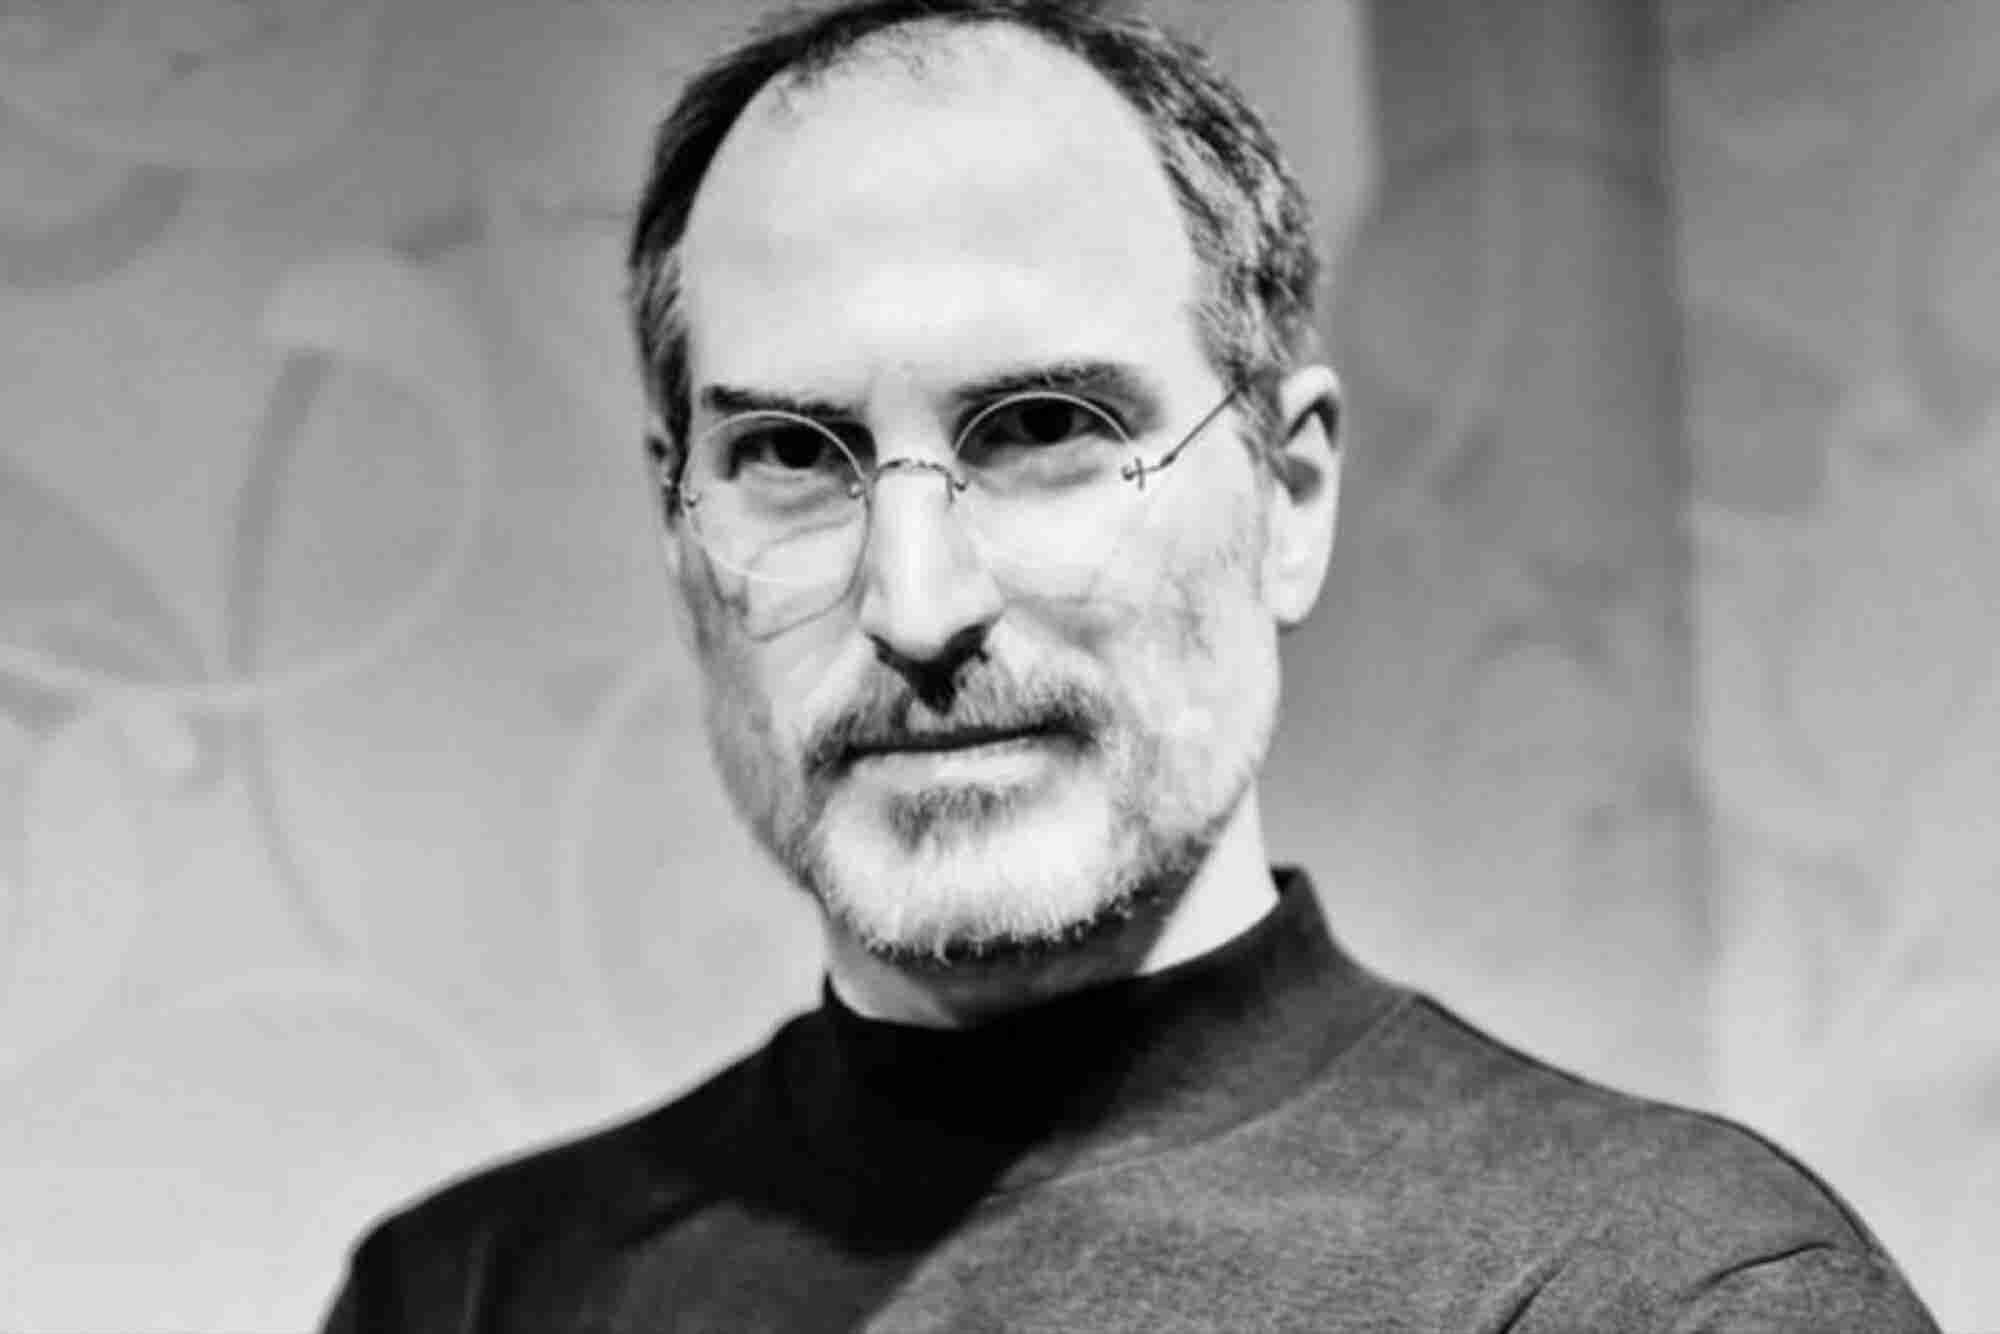 ¿Quieres triunfar en la vida? Aquí el consejo de Steve Jobs para logra...